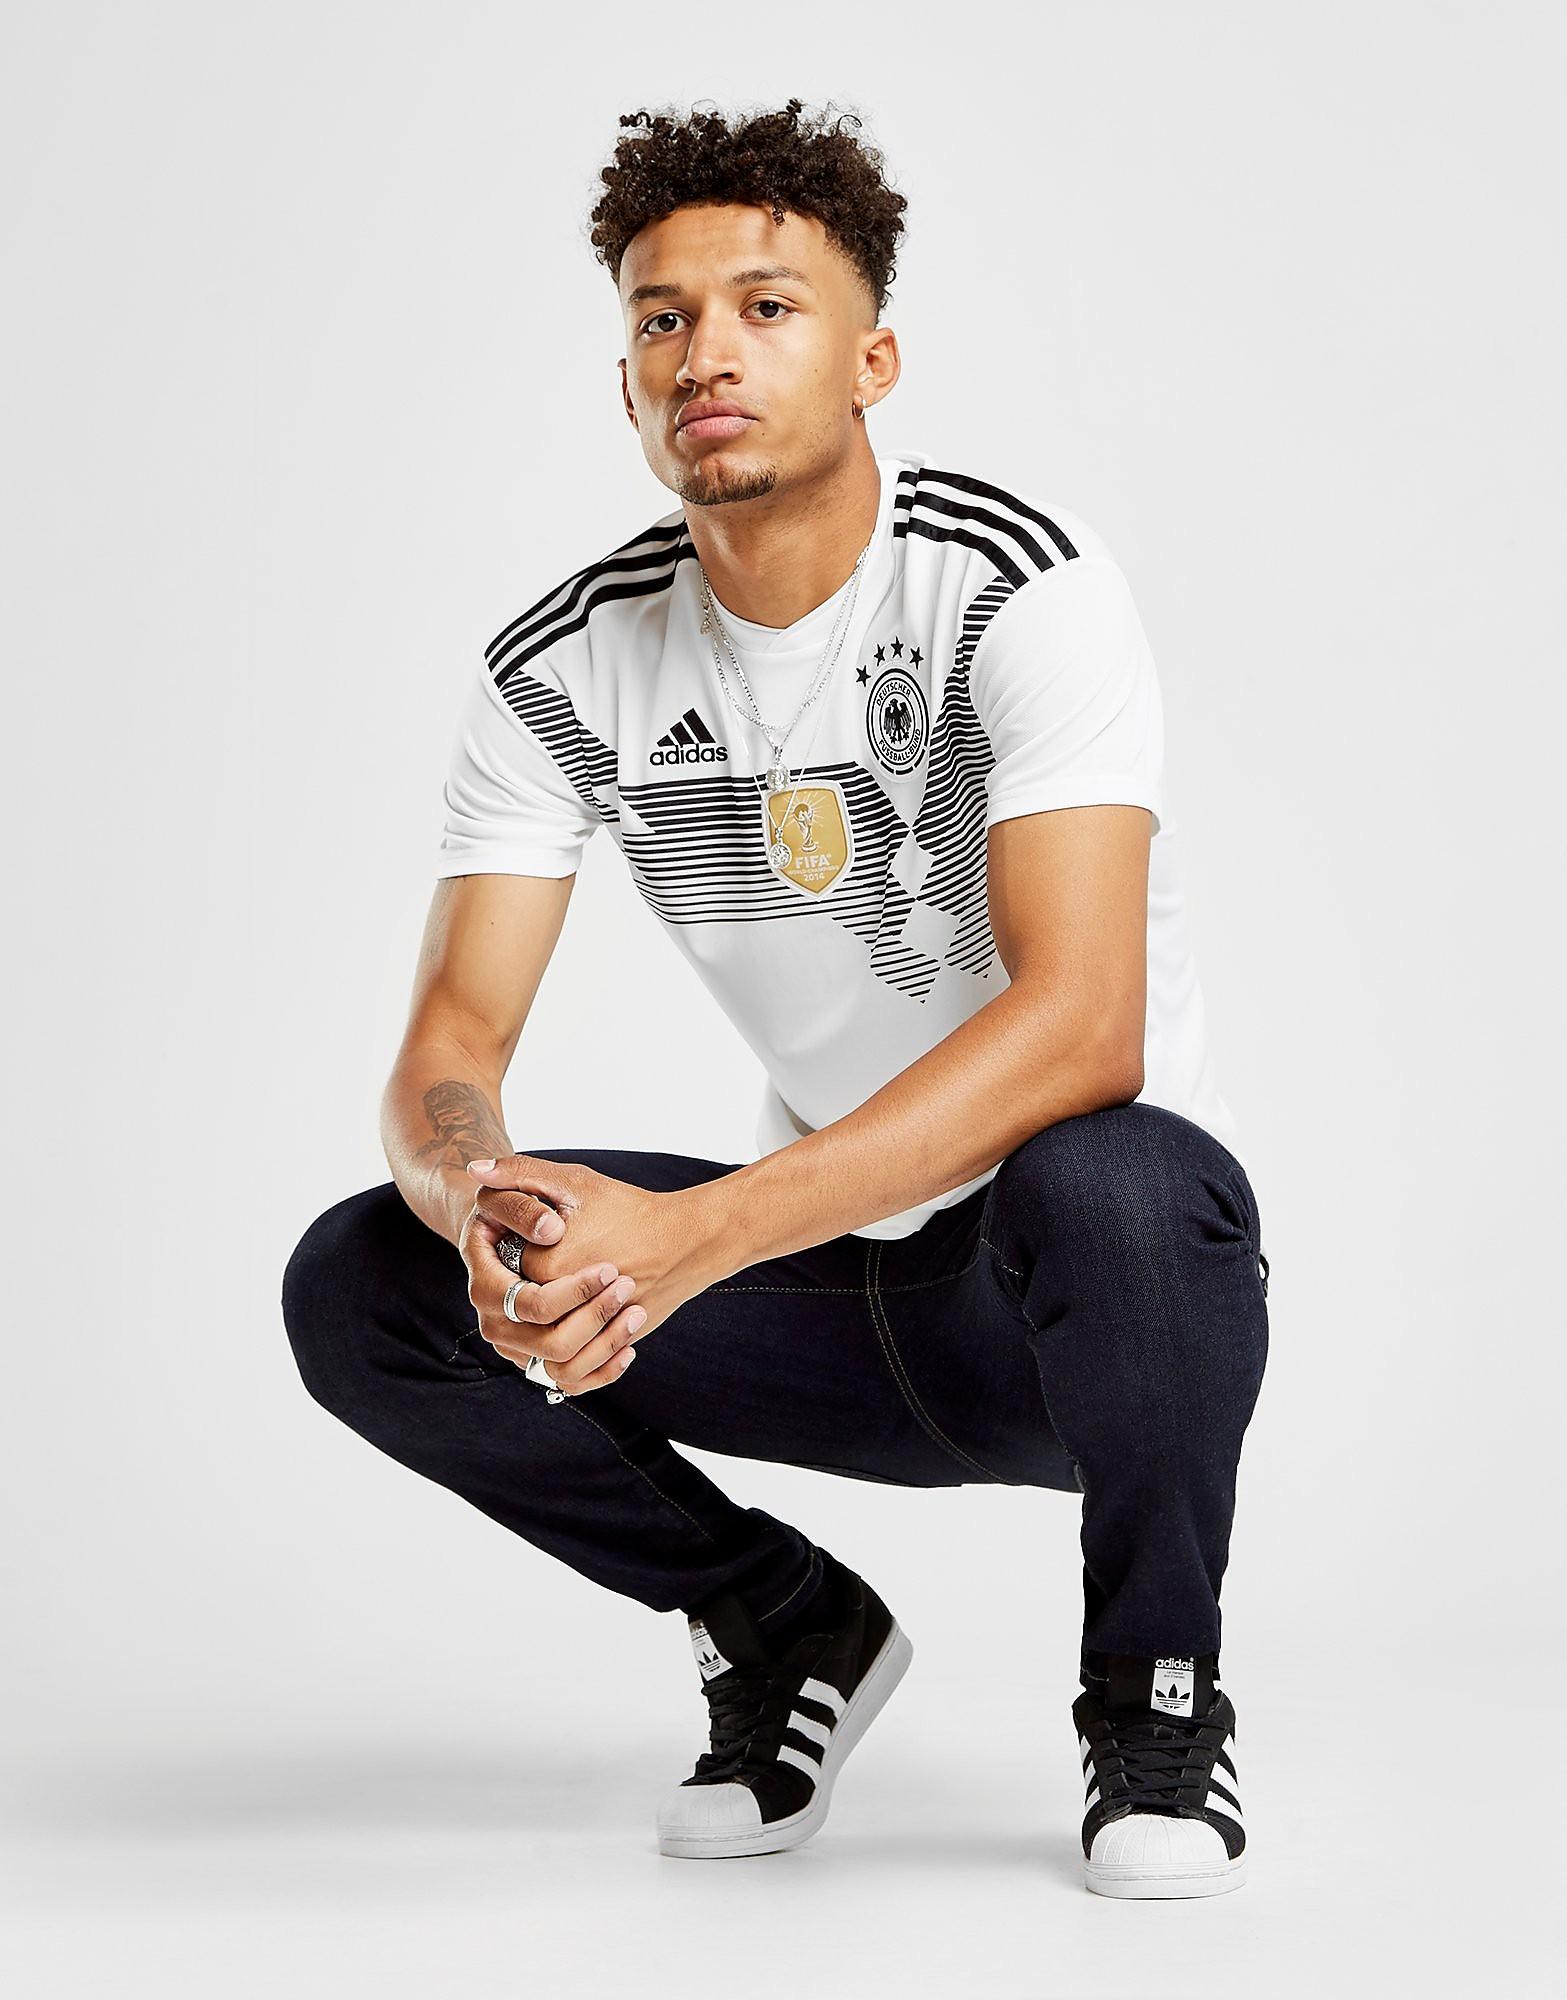 adidas camiseta Alemania 2017/18 1.ª equipación